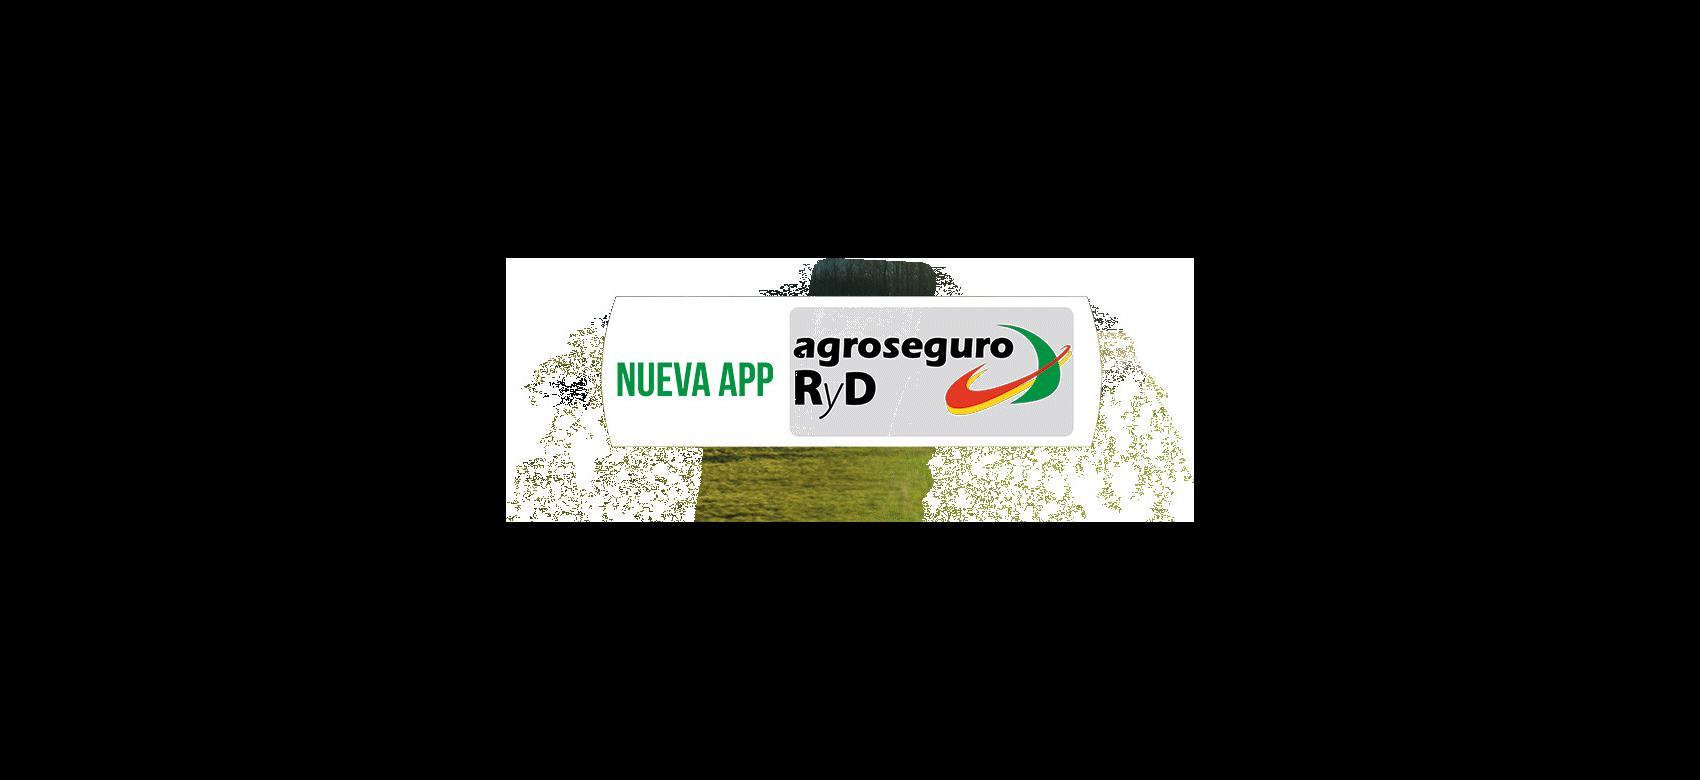 "Texto""""Nueva app AGROSEGURO RyD"""